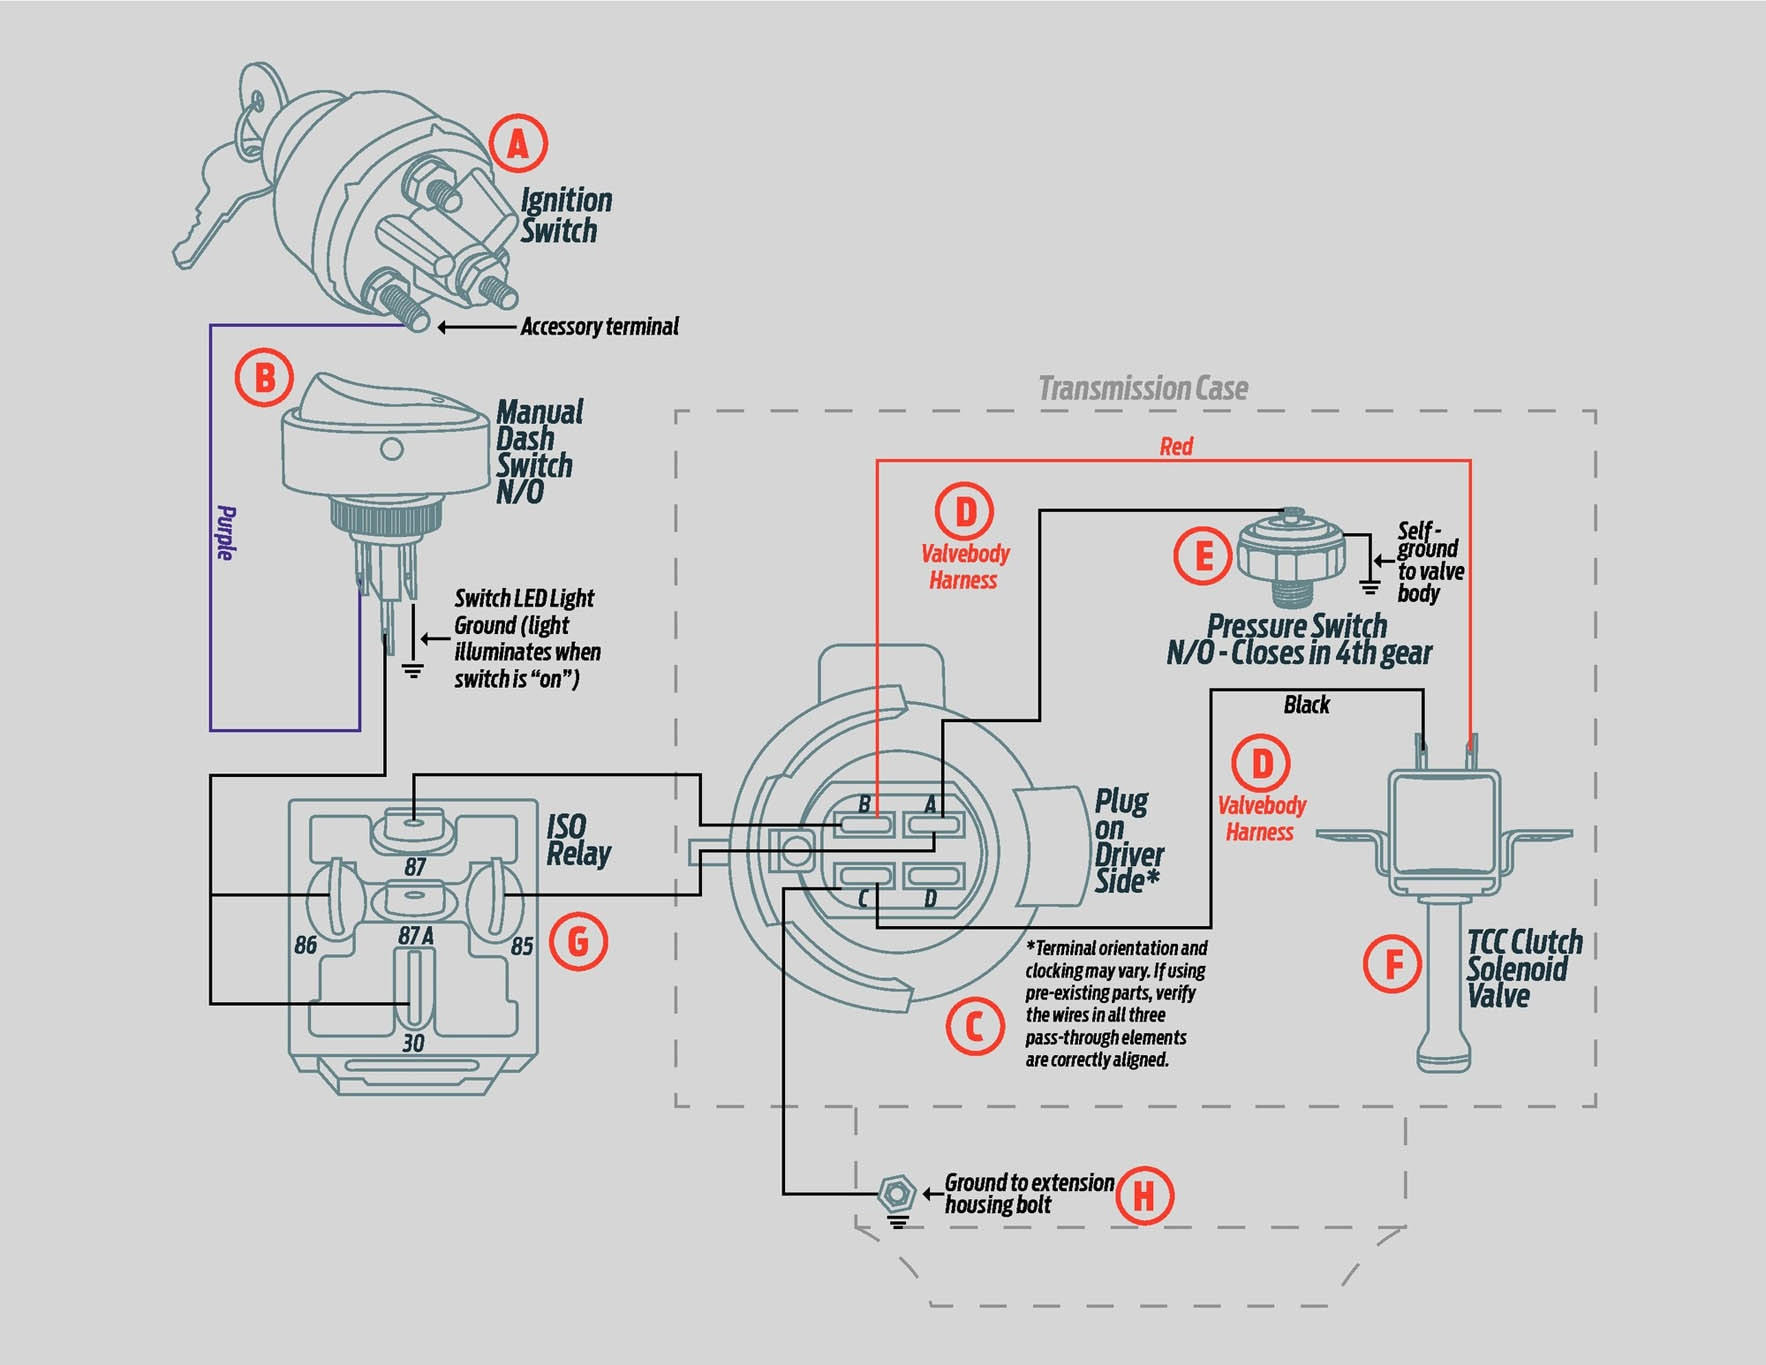 700r4 automatic transmission diagram wiring diagram paper 4l60e transmission wiring diagram computer [ 1766 x 1365 Pixel ]